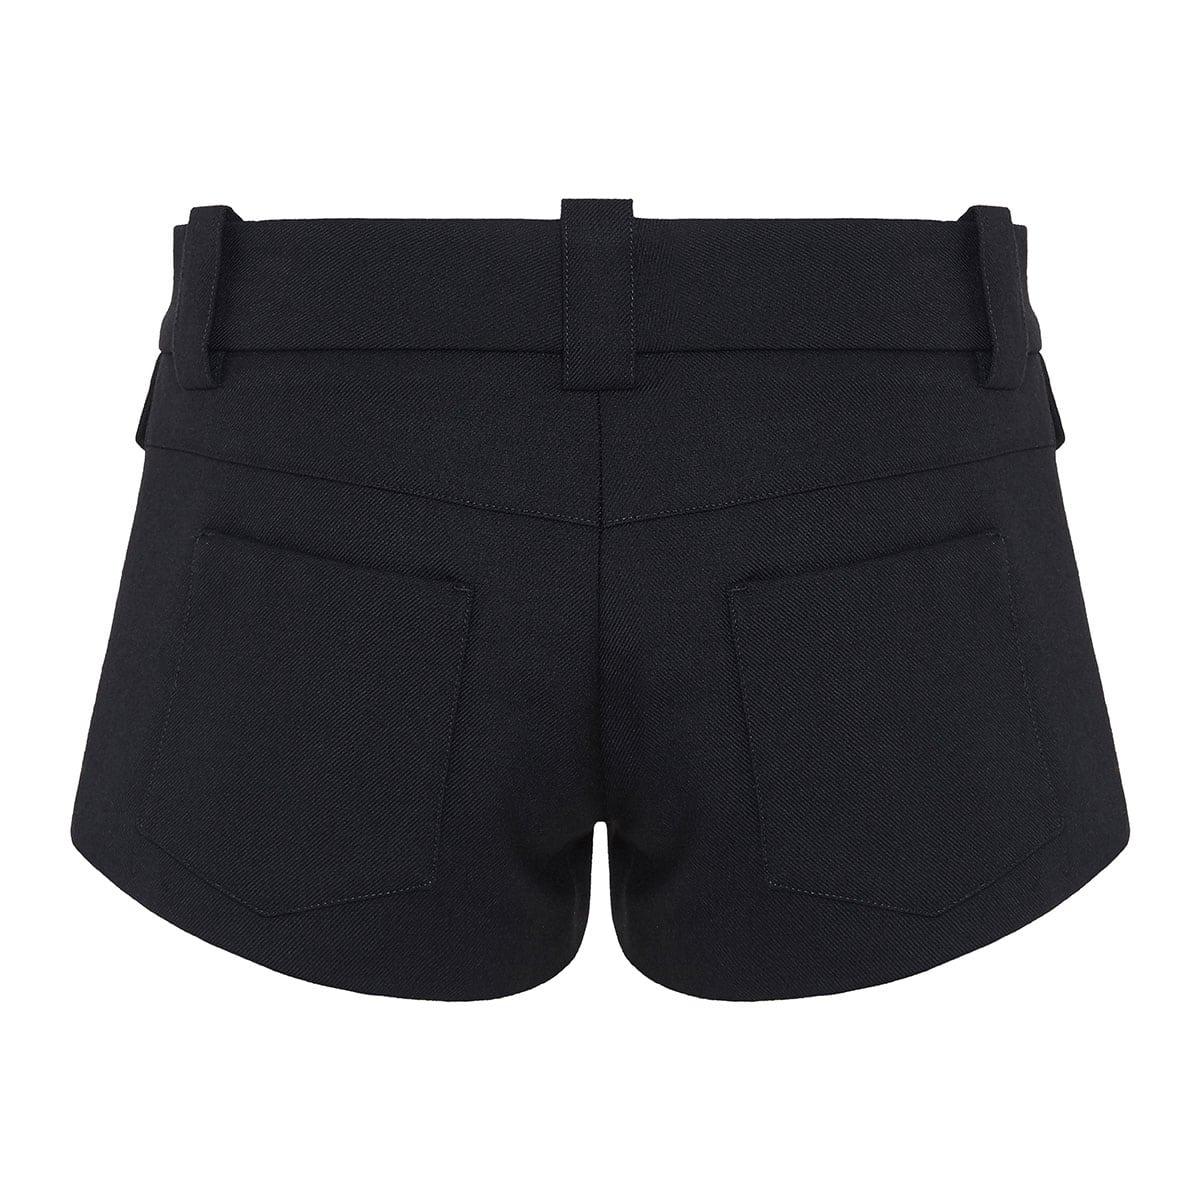 Wool micro shorts